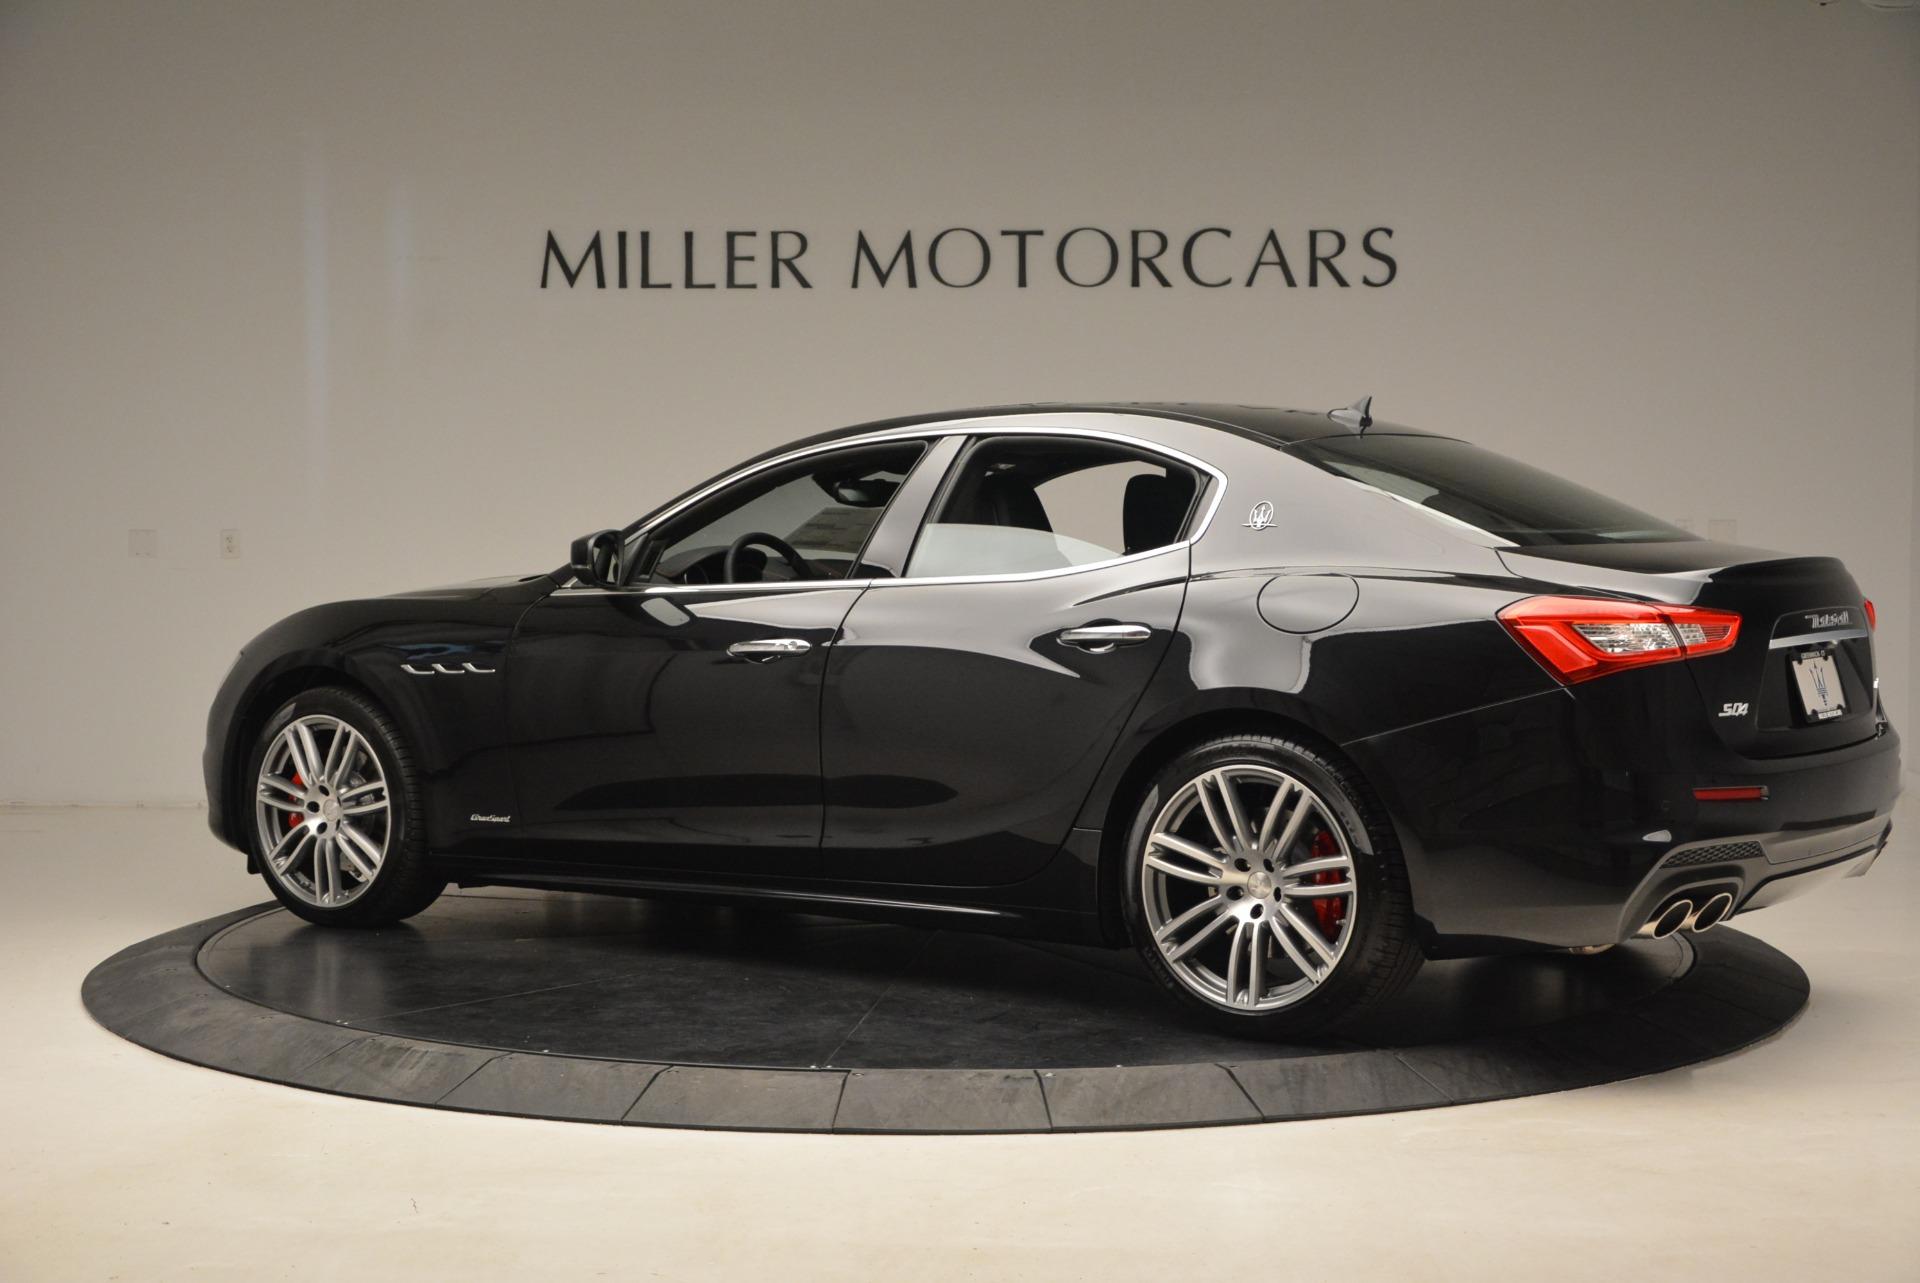 New 2019 Maserati Ghibli S Q4 GranSport For Sale In Westport, CT 2615_p4